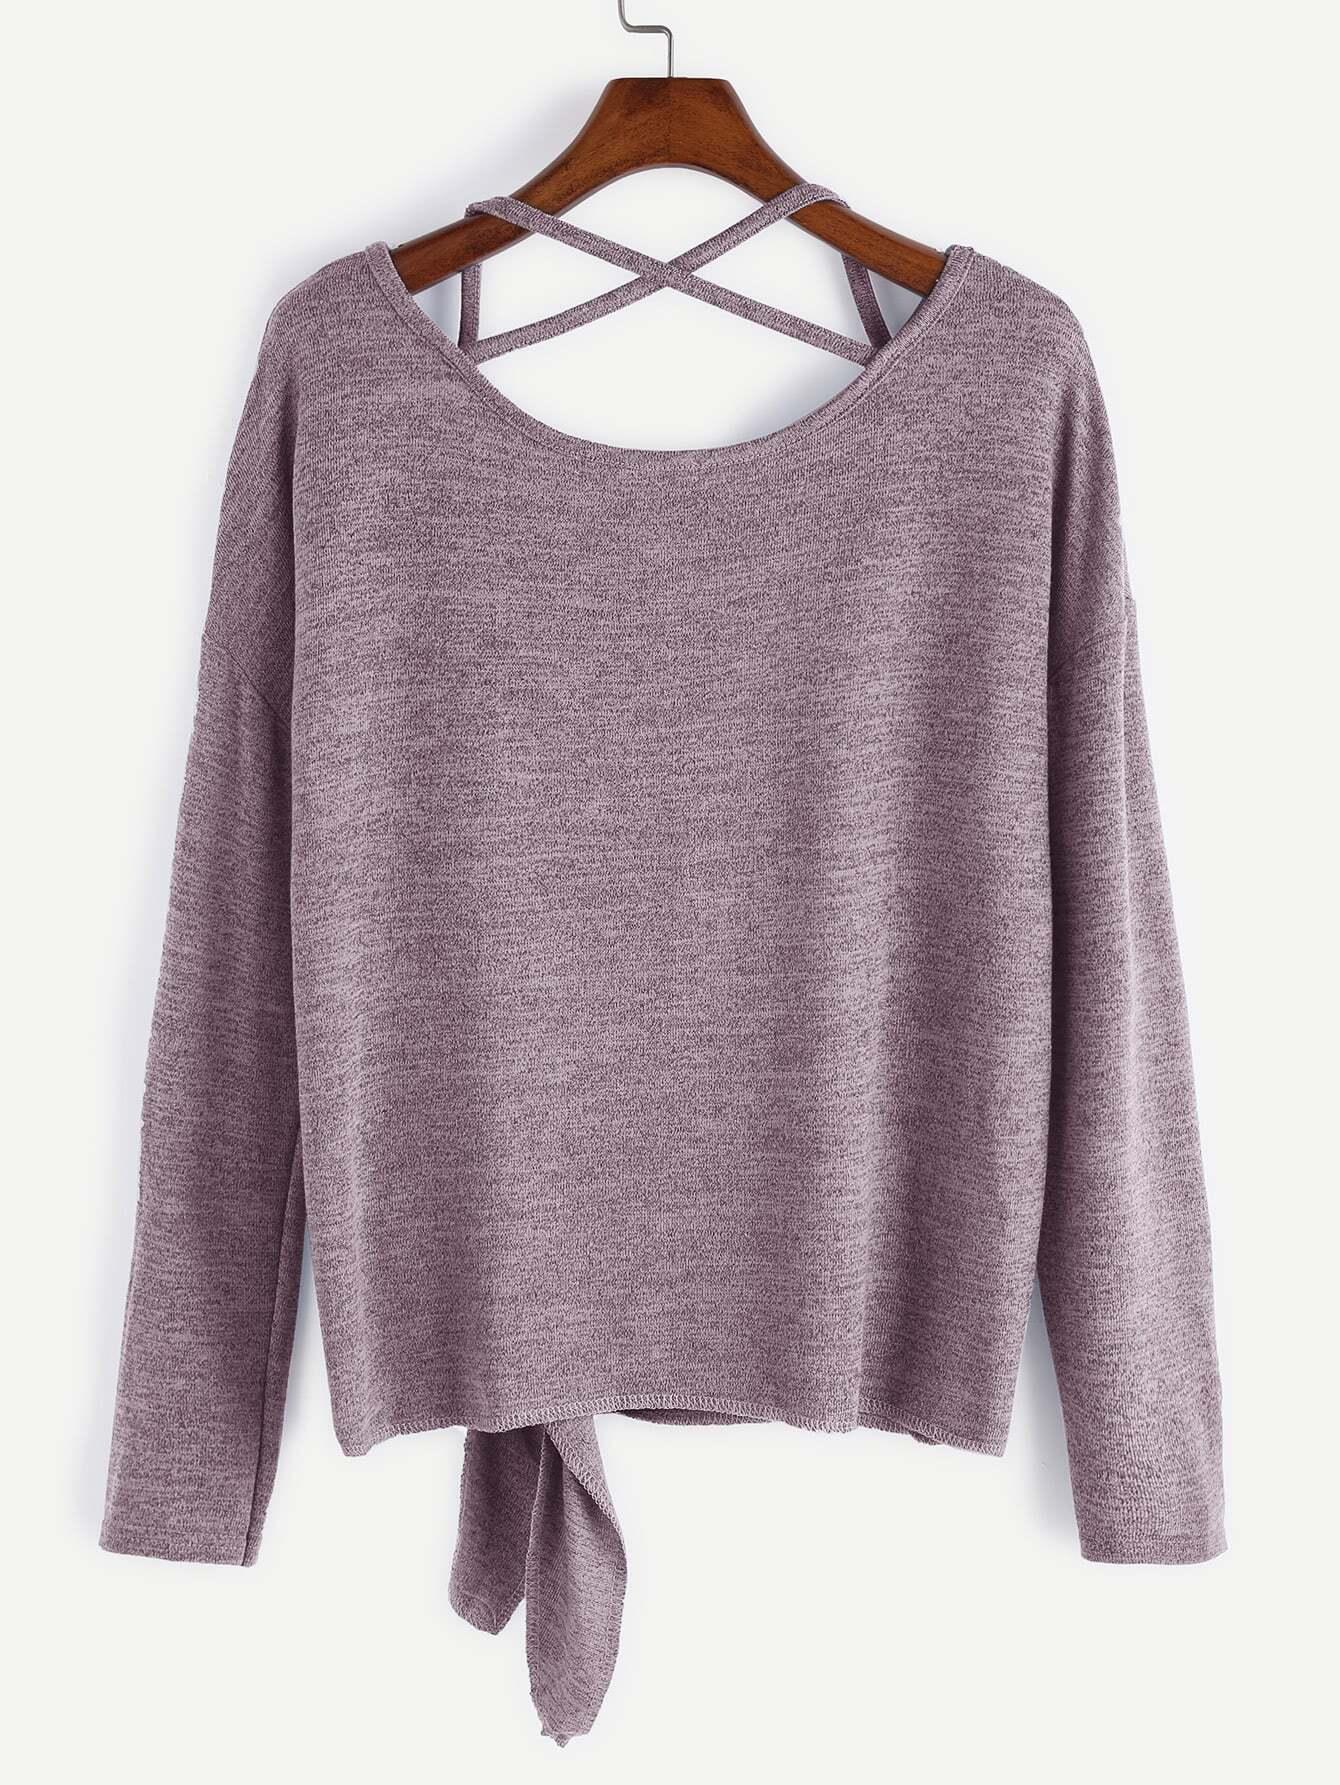 Pink Drop Shoulder Criss Cross Tie Front T-Shirt